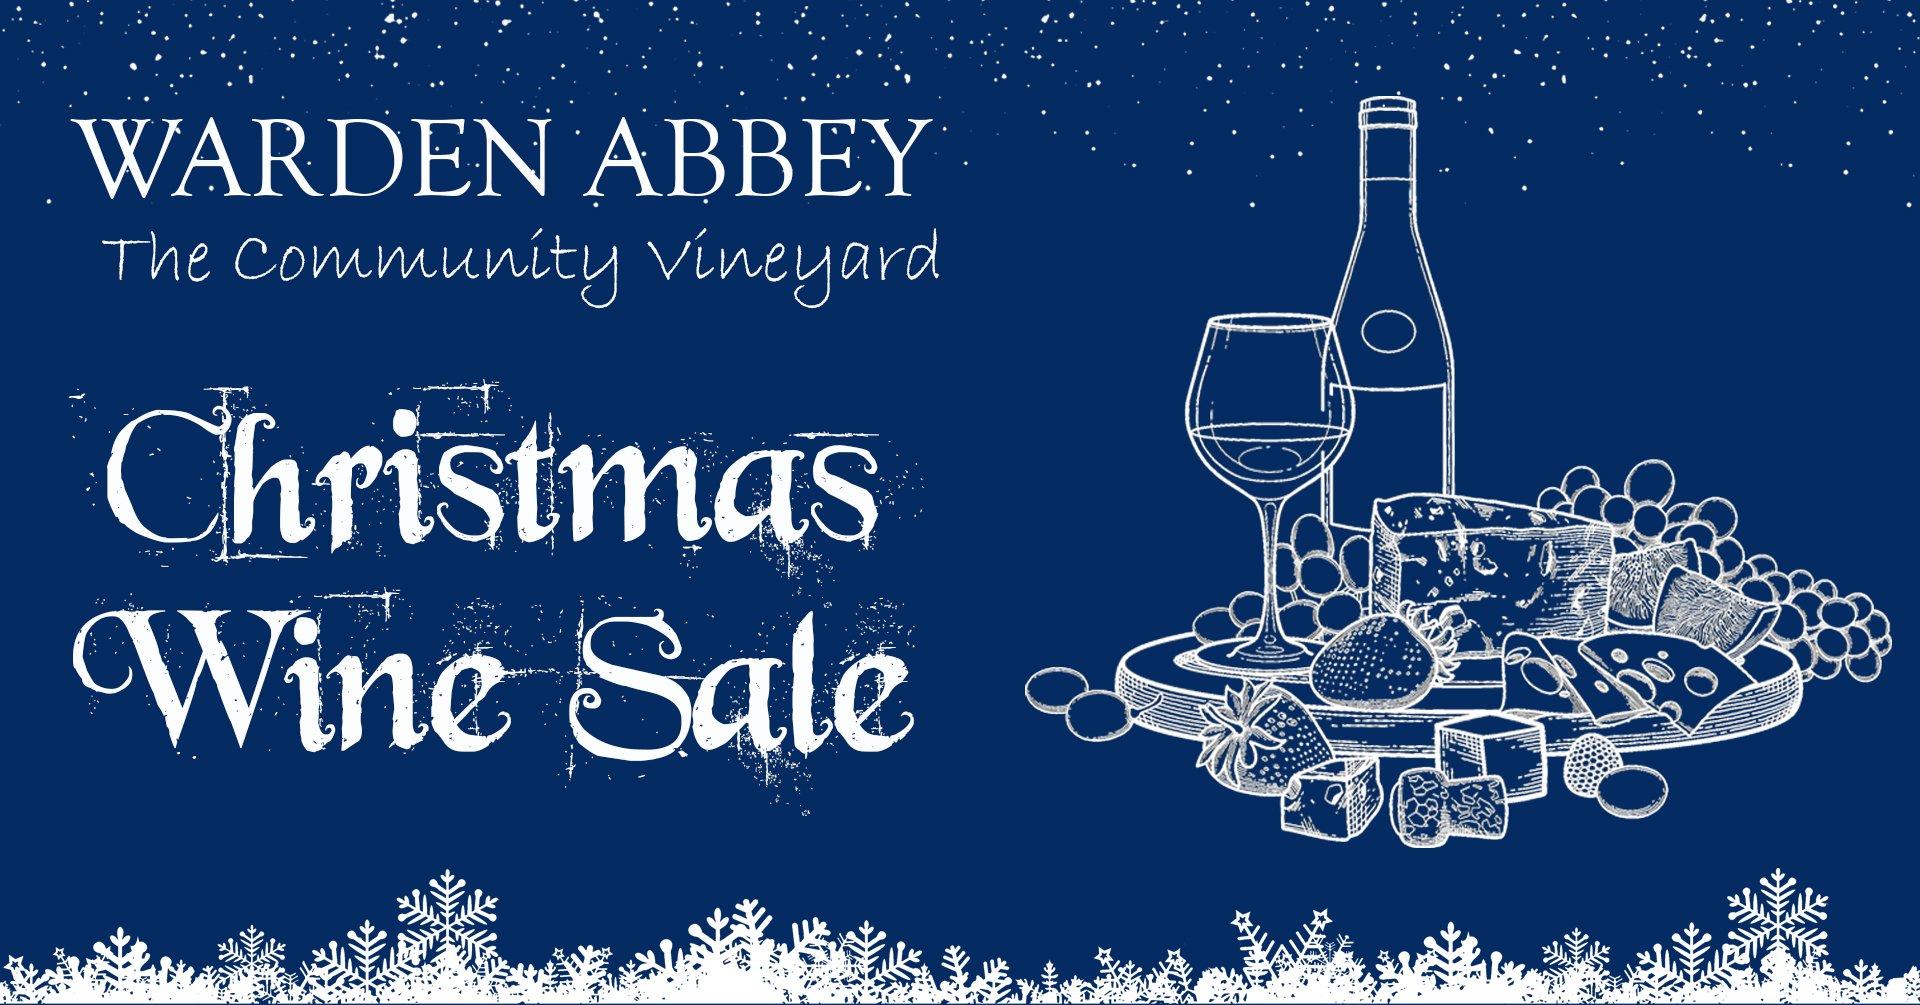 Warden Abbey Christmas wine sale poster